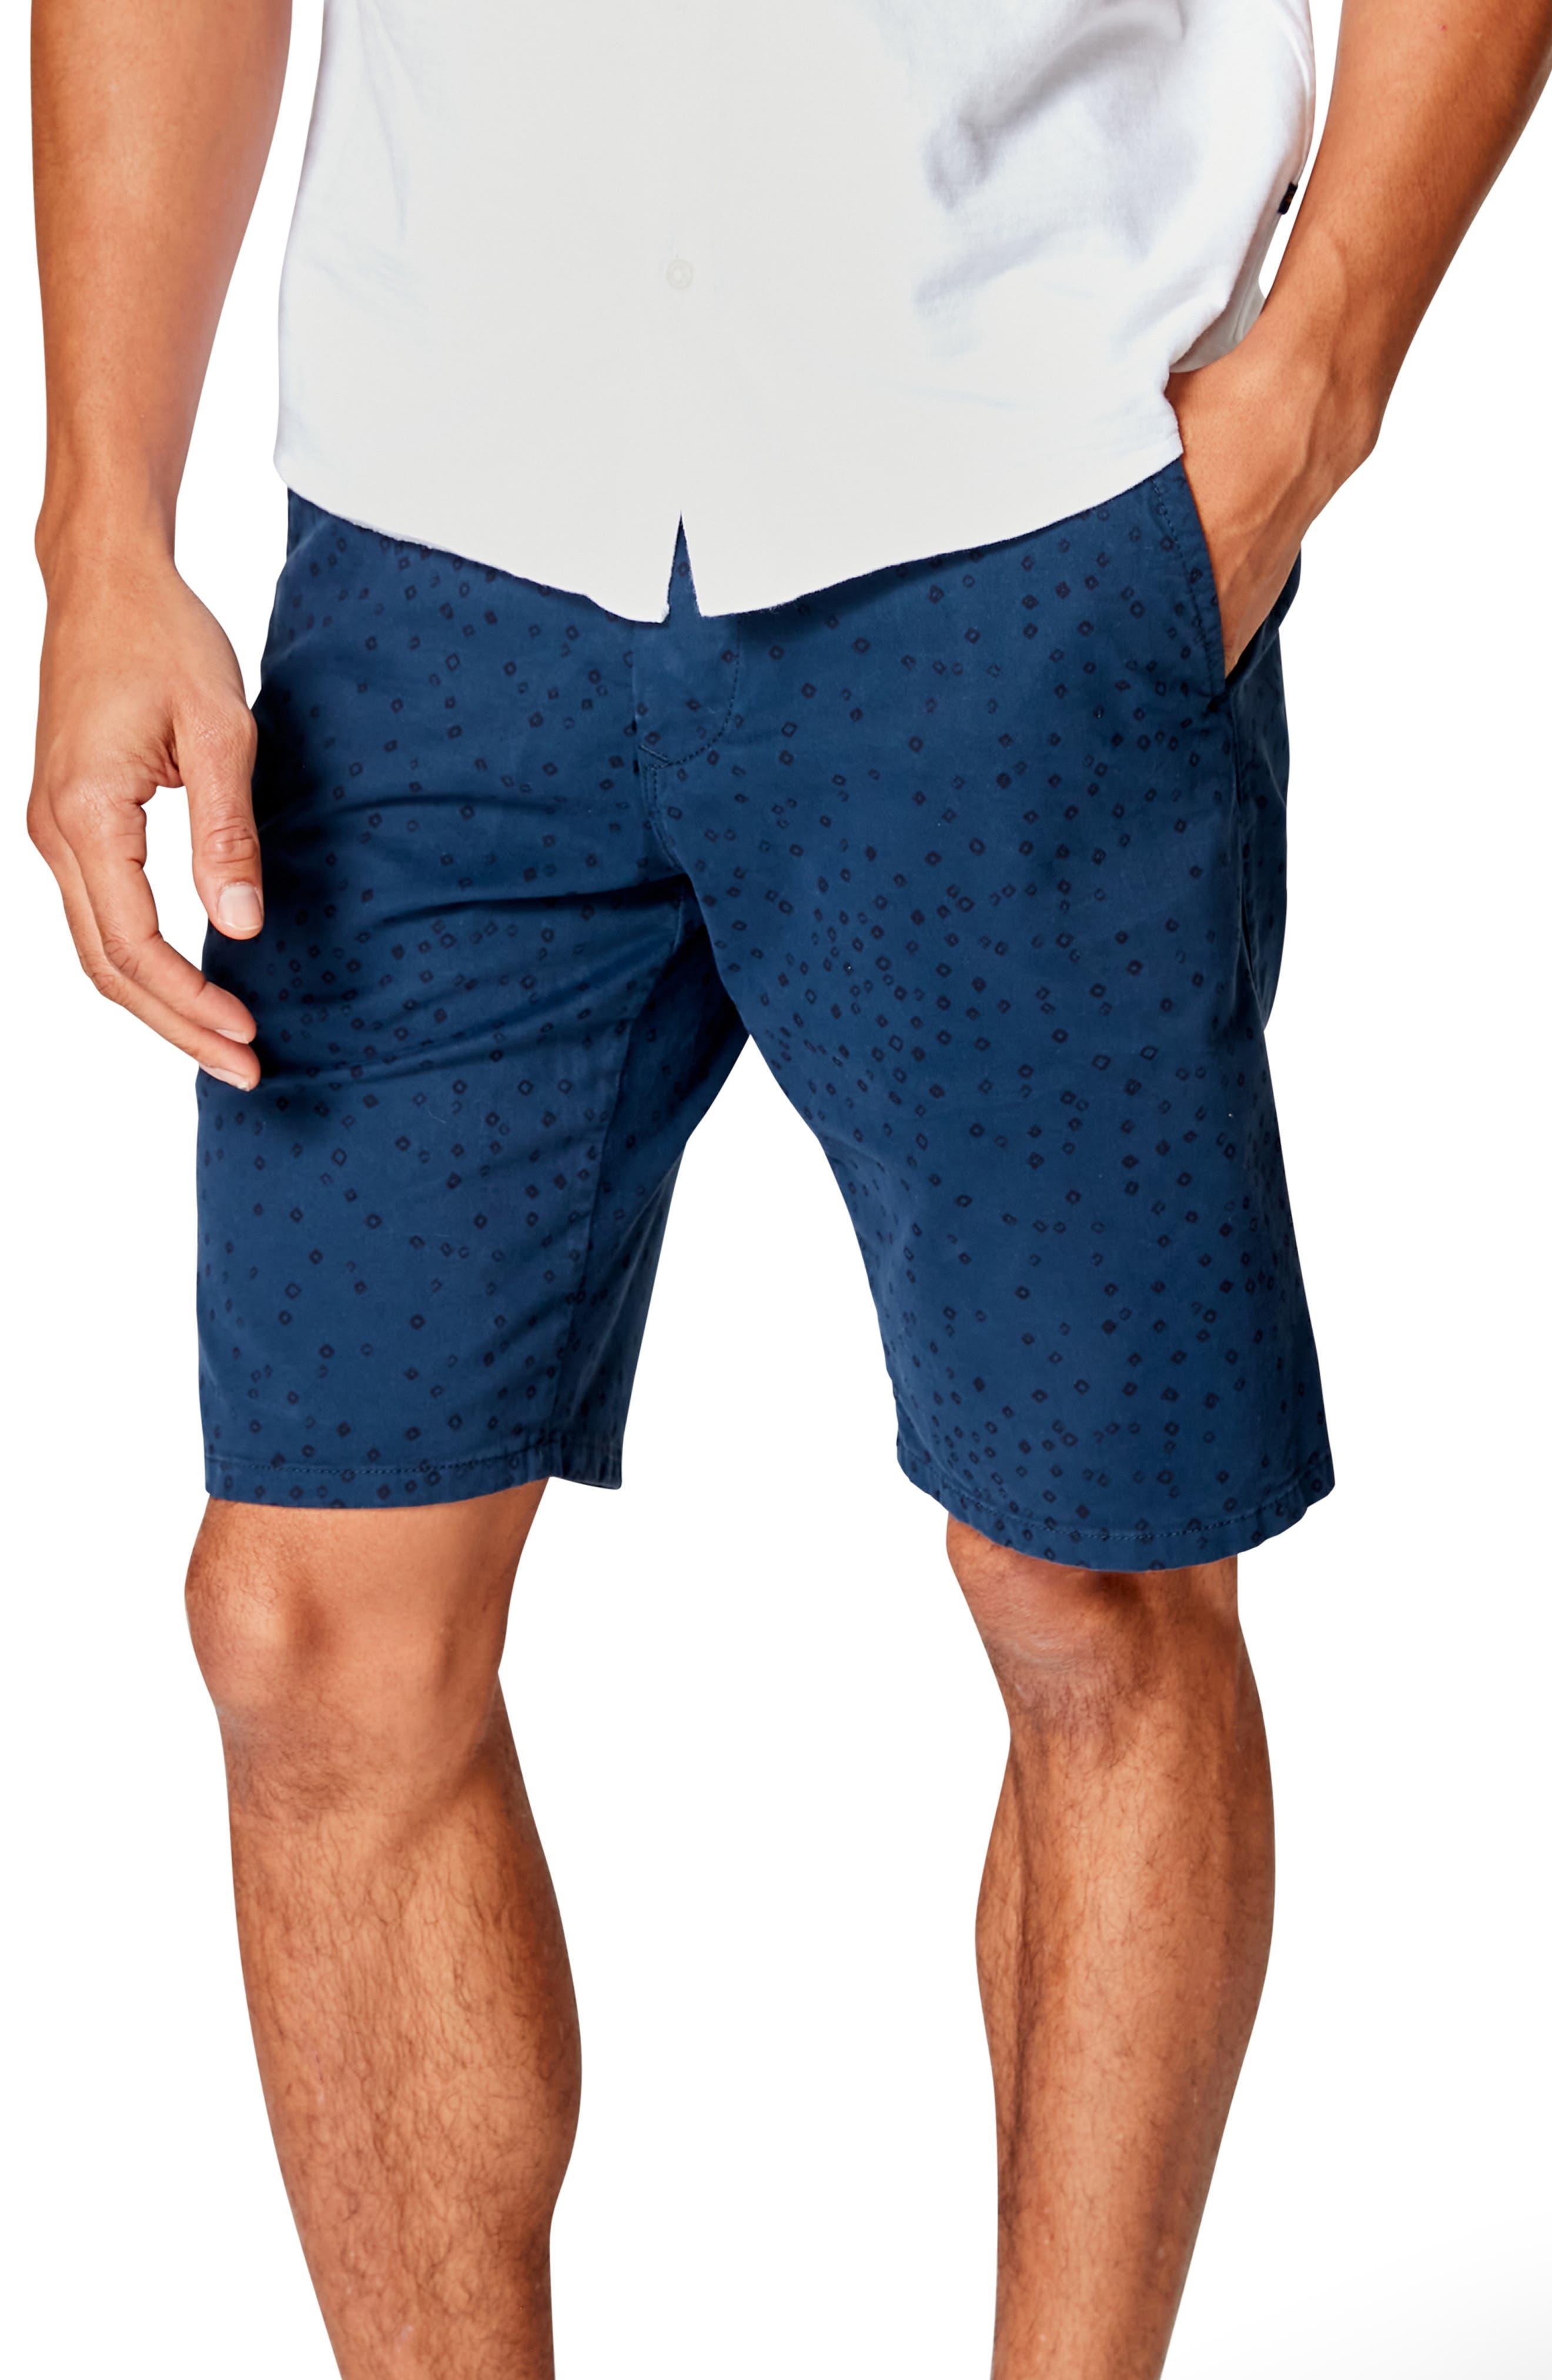 Monaco Slim Fit Flat Front Shorts